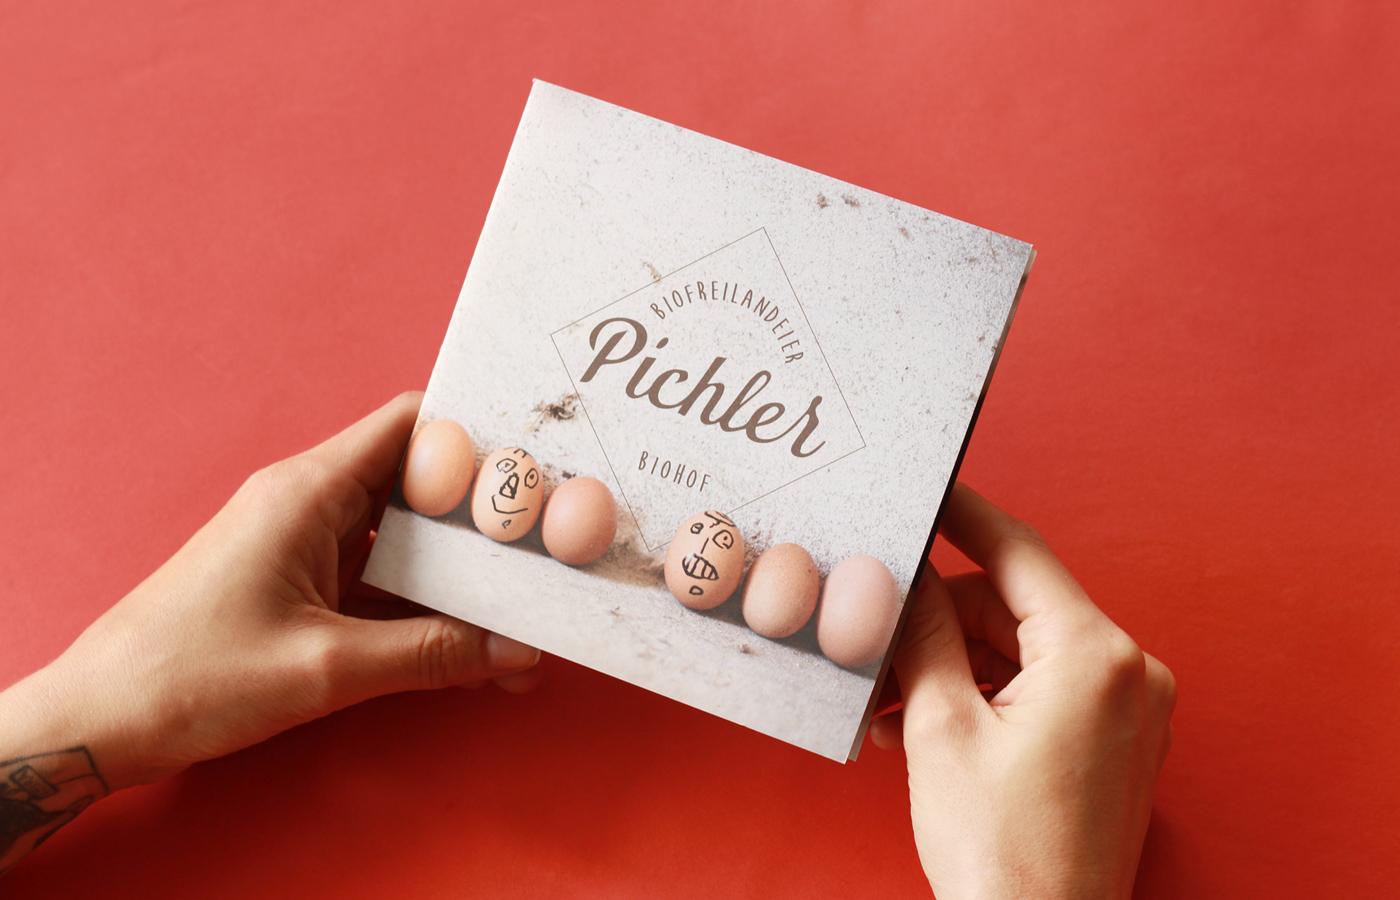 biohof-pichler-01-folder